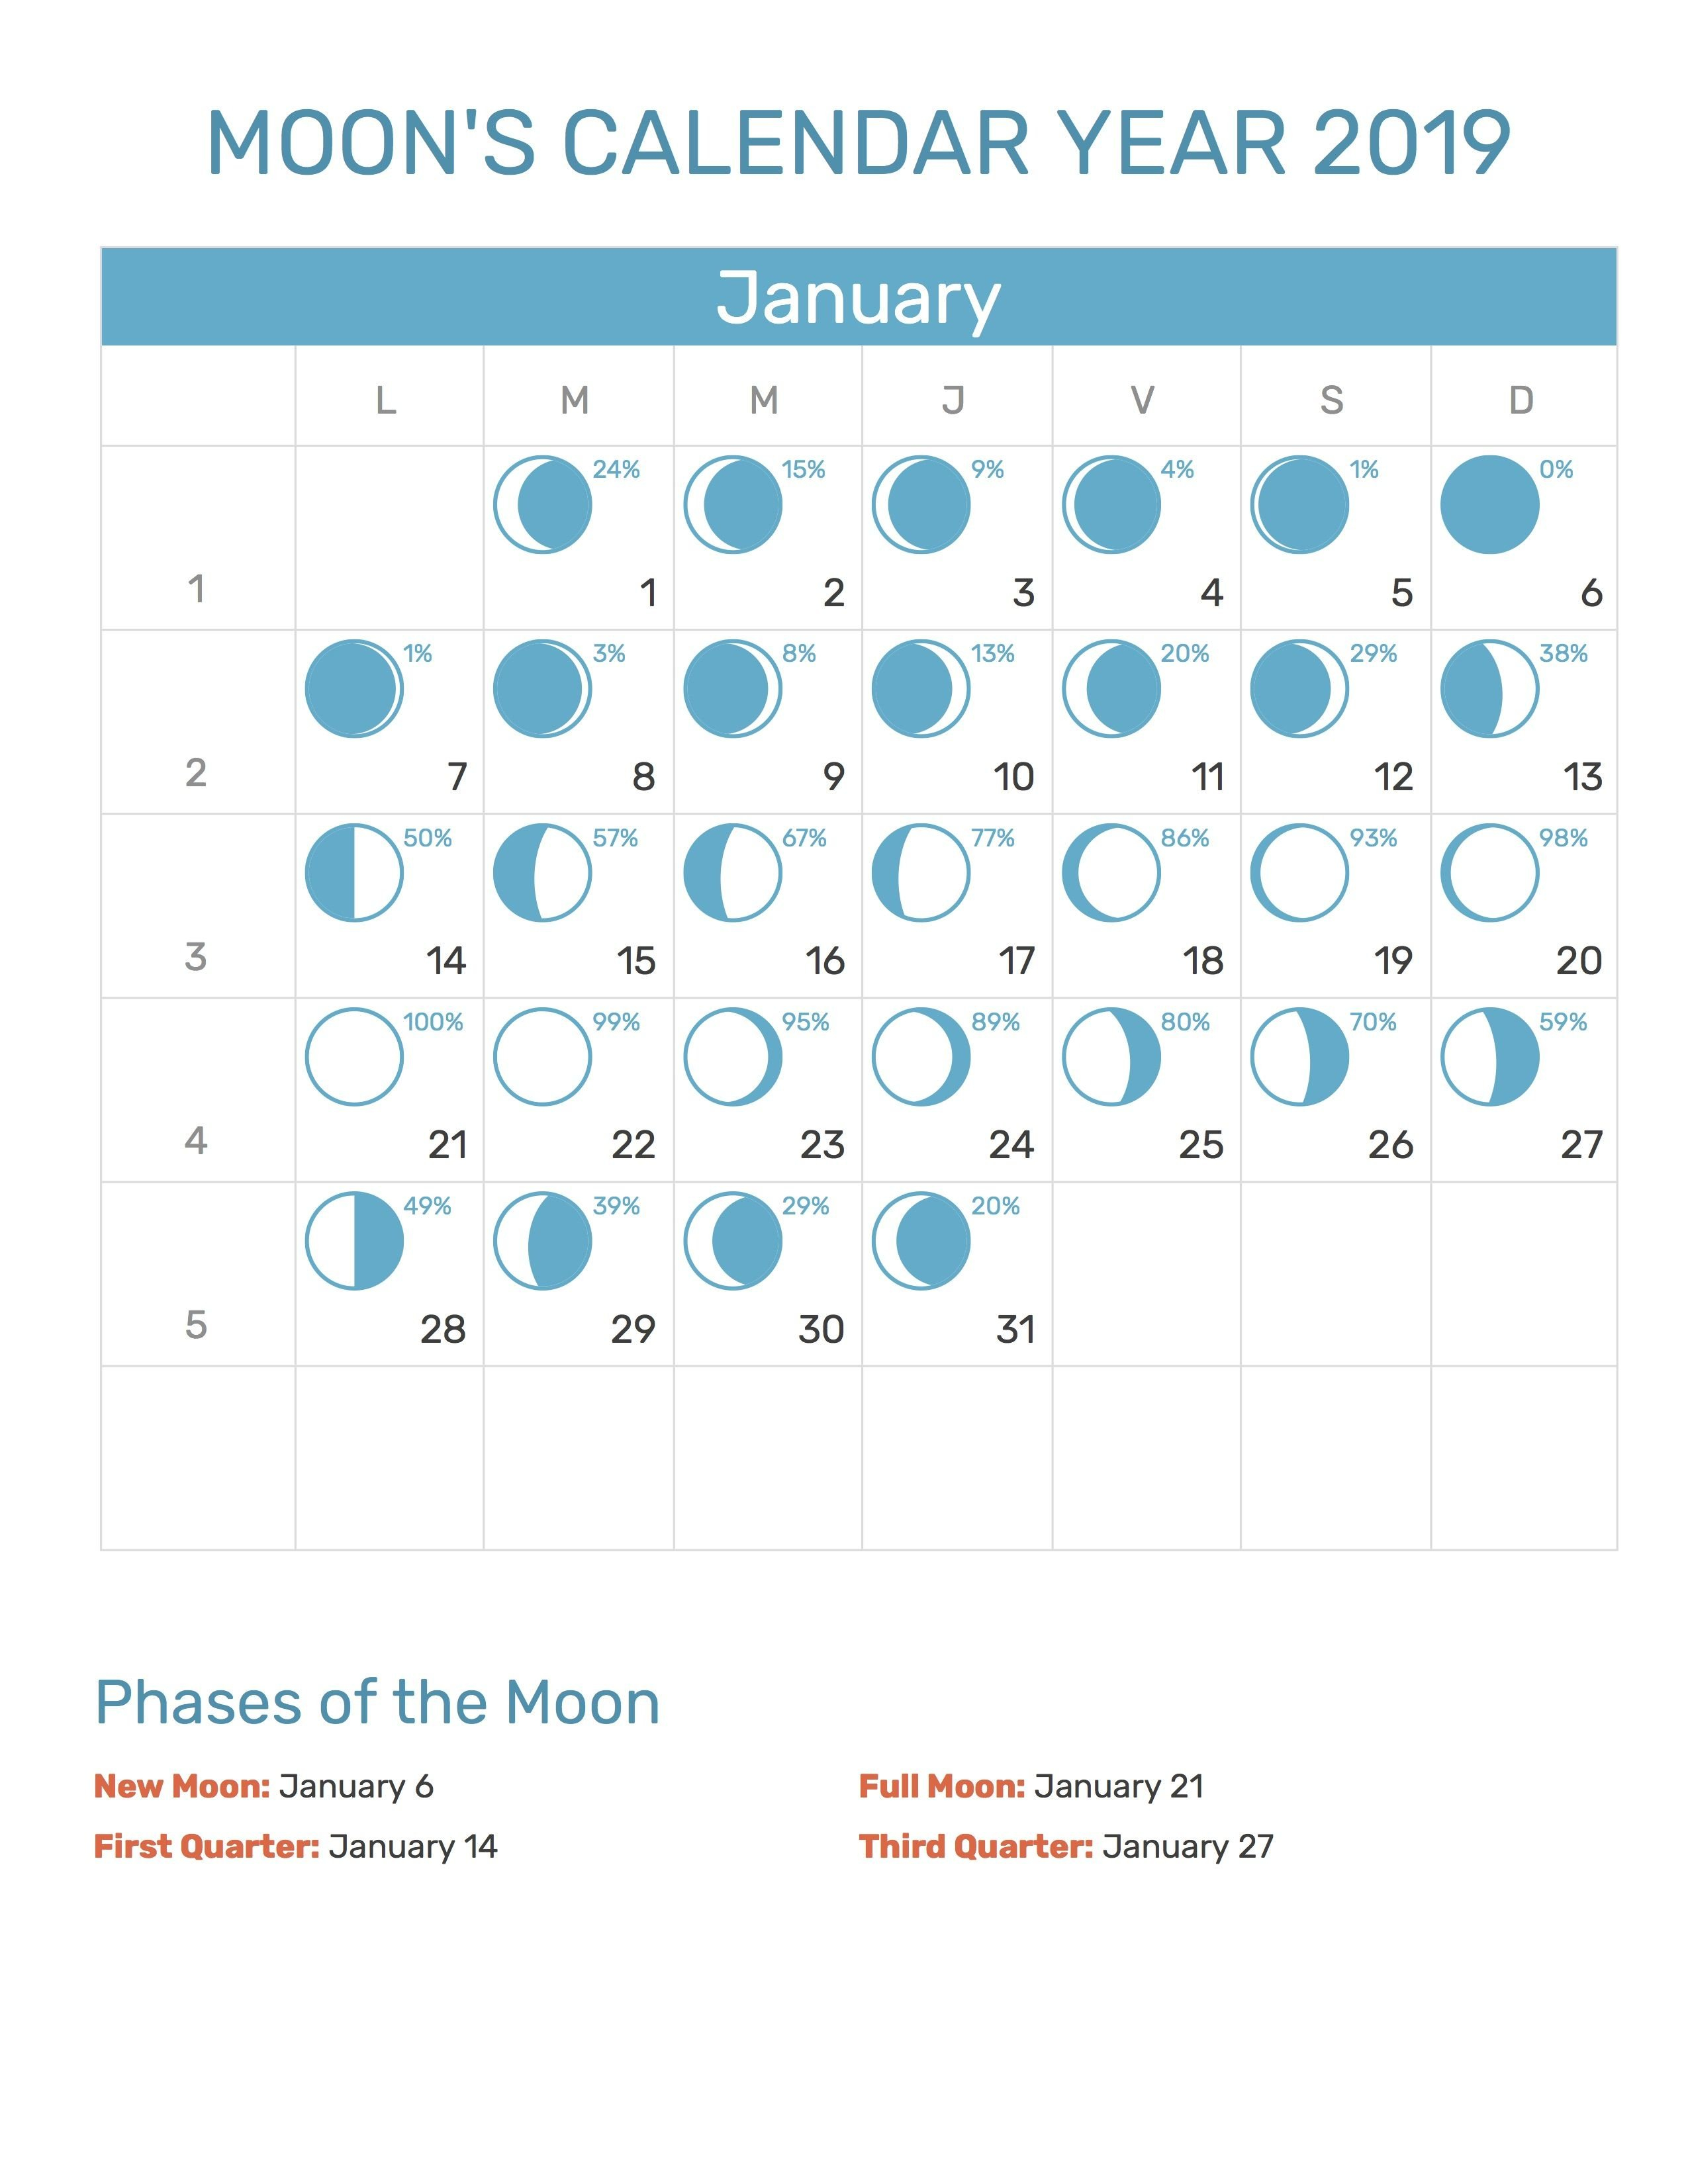 January 2019 Full Moon Calendar And Dates | Moonbeam | Moon Phase Calendar 2019 Lunar